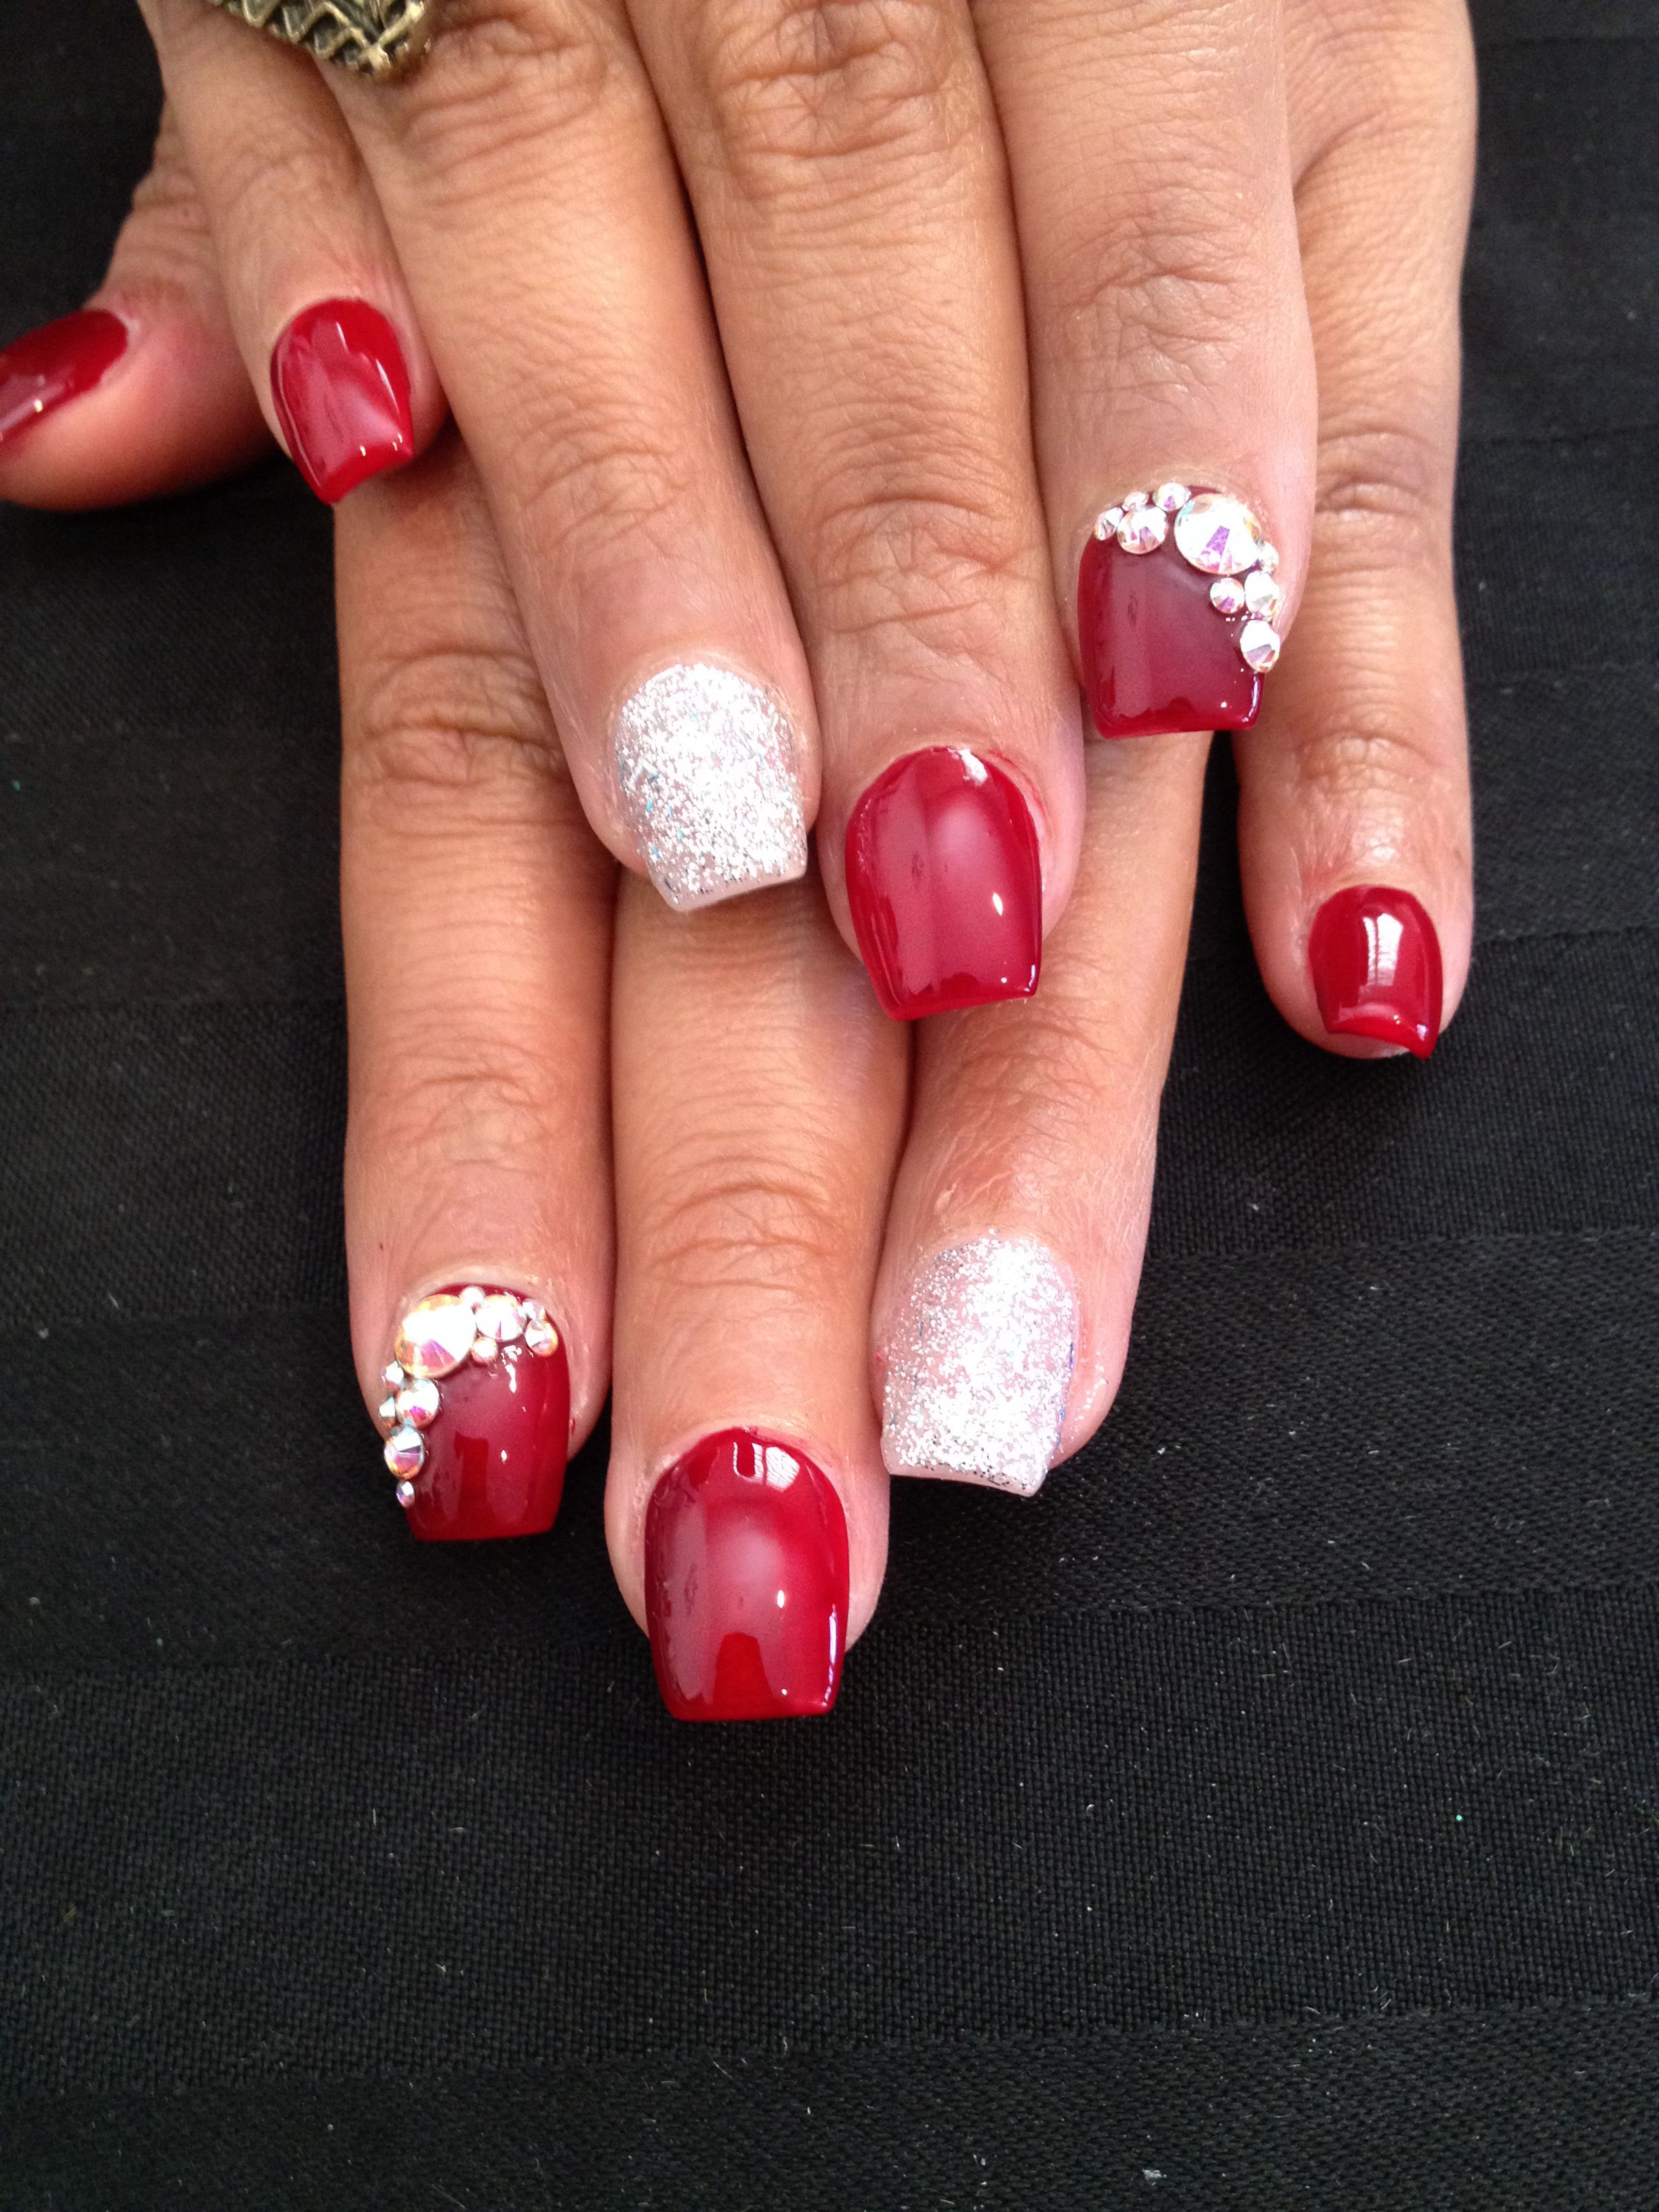 Short Red Coffin Nails | Christmas nails acrylic, Short ...